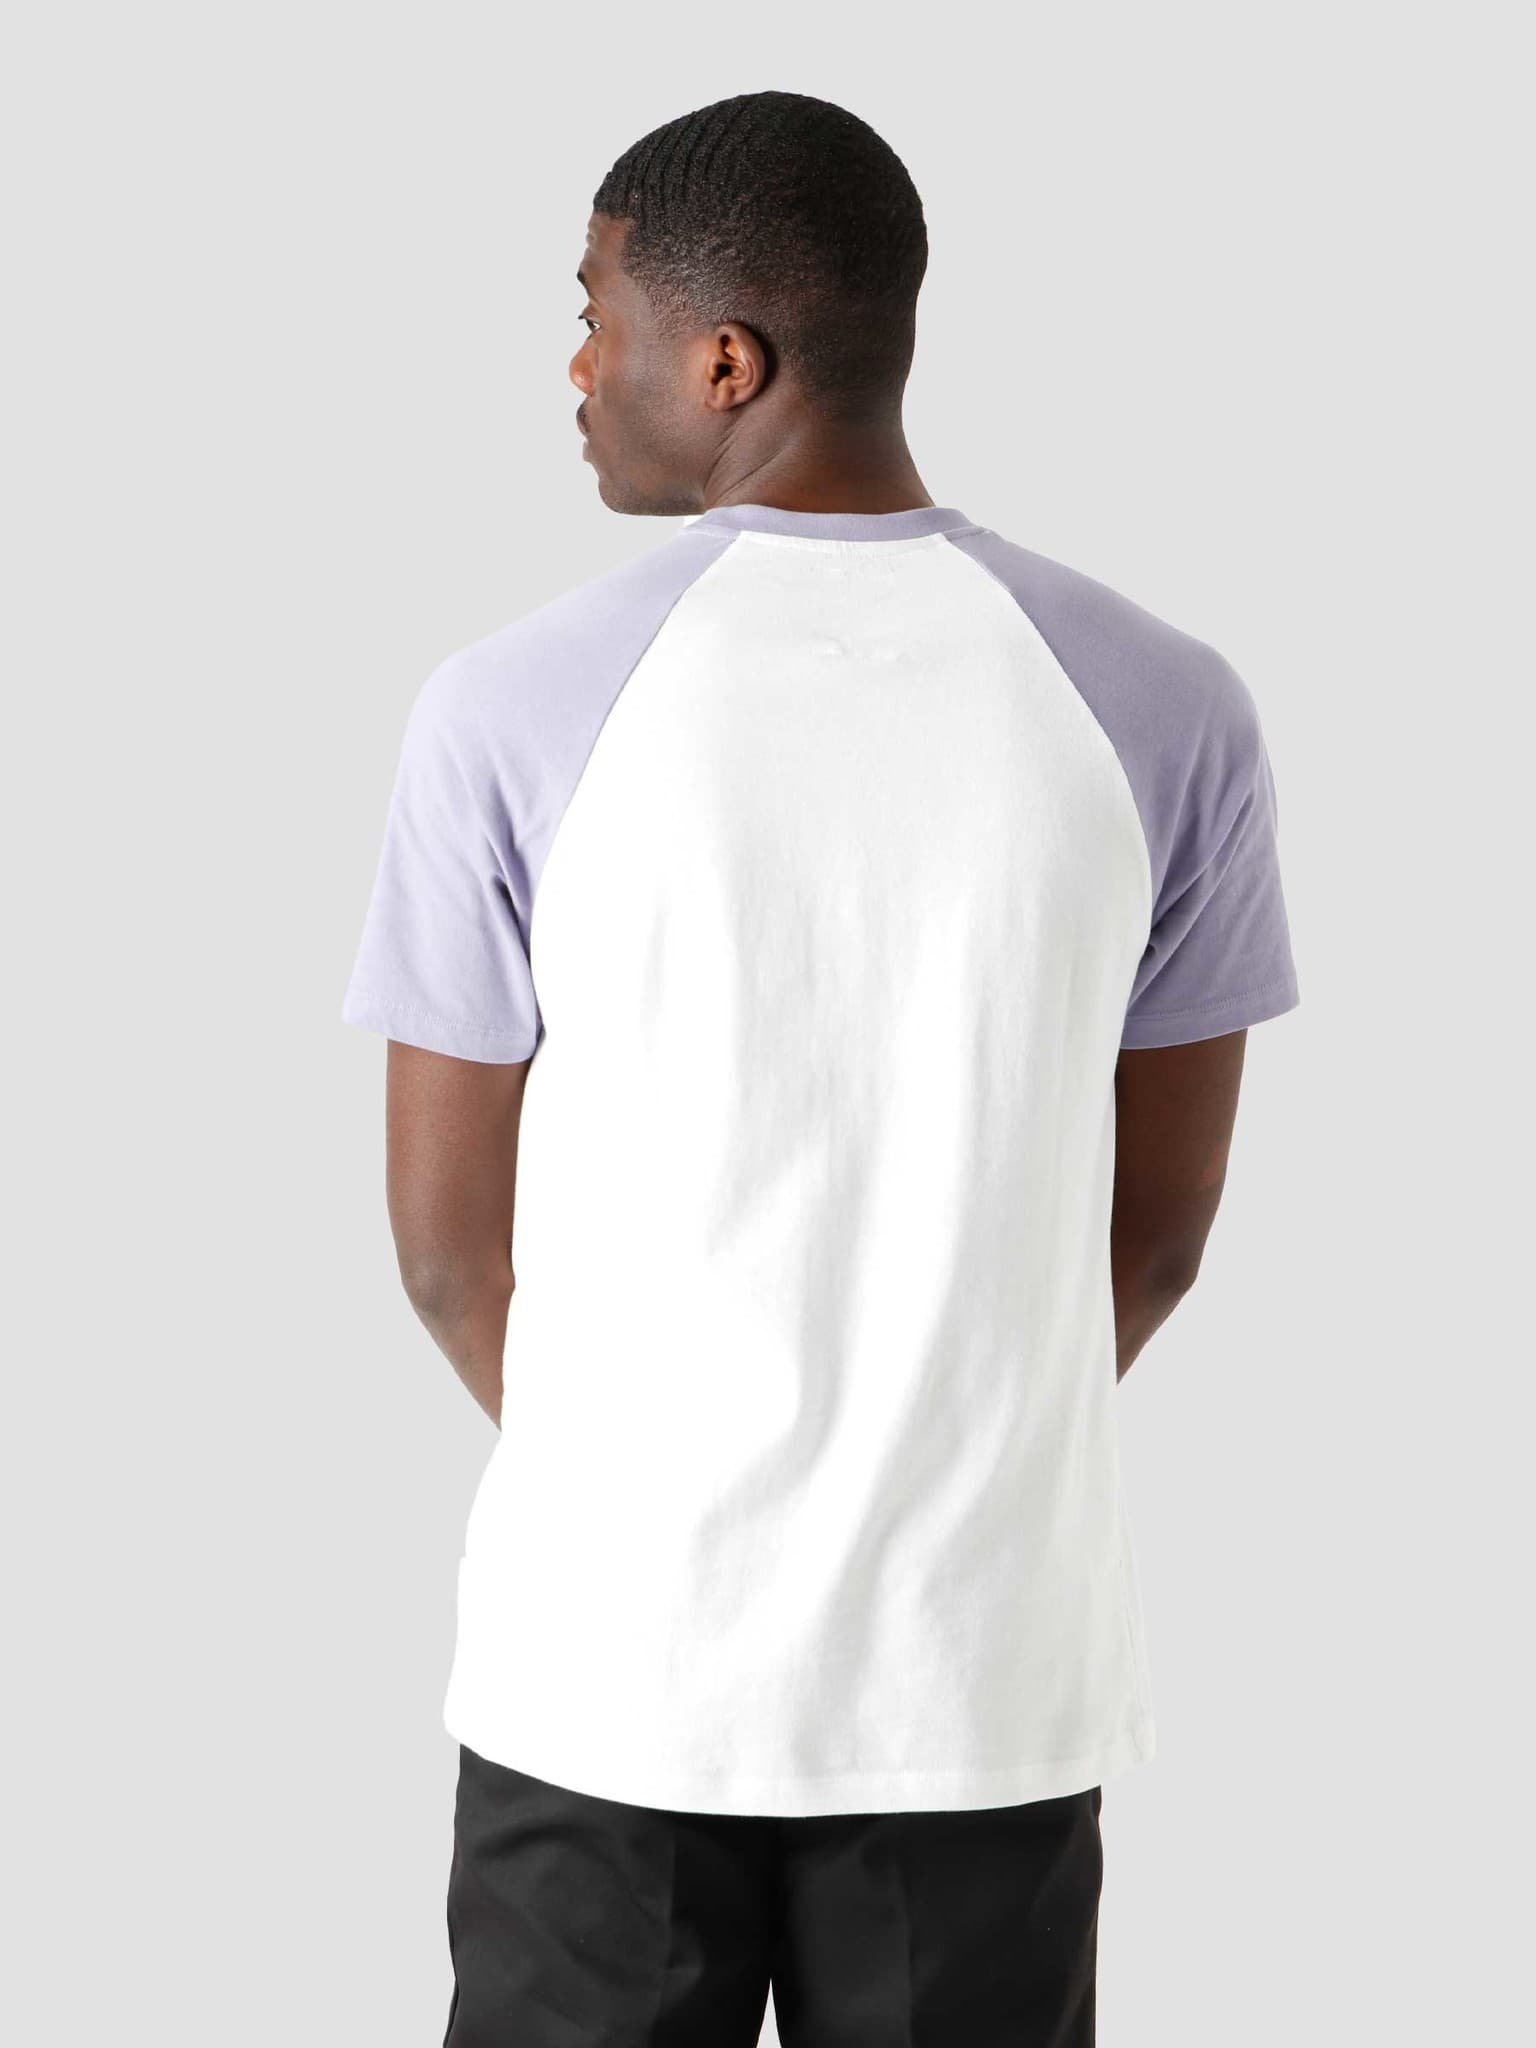 QB07 Patch Logo Baseball T-shirt White Lilac